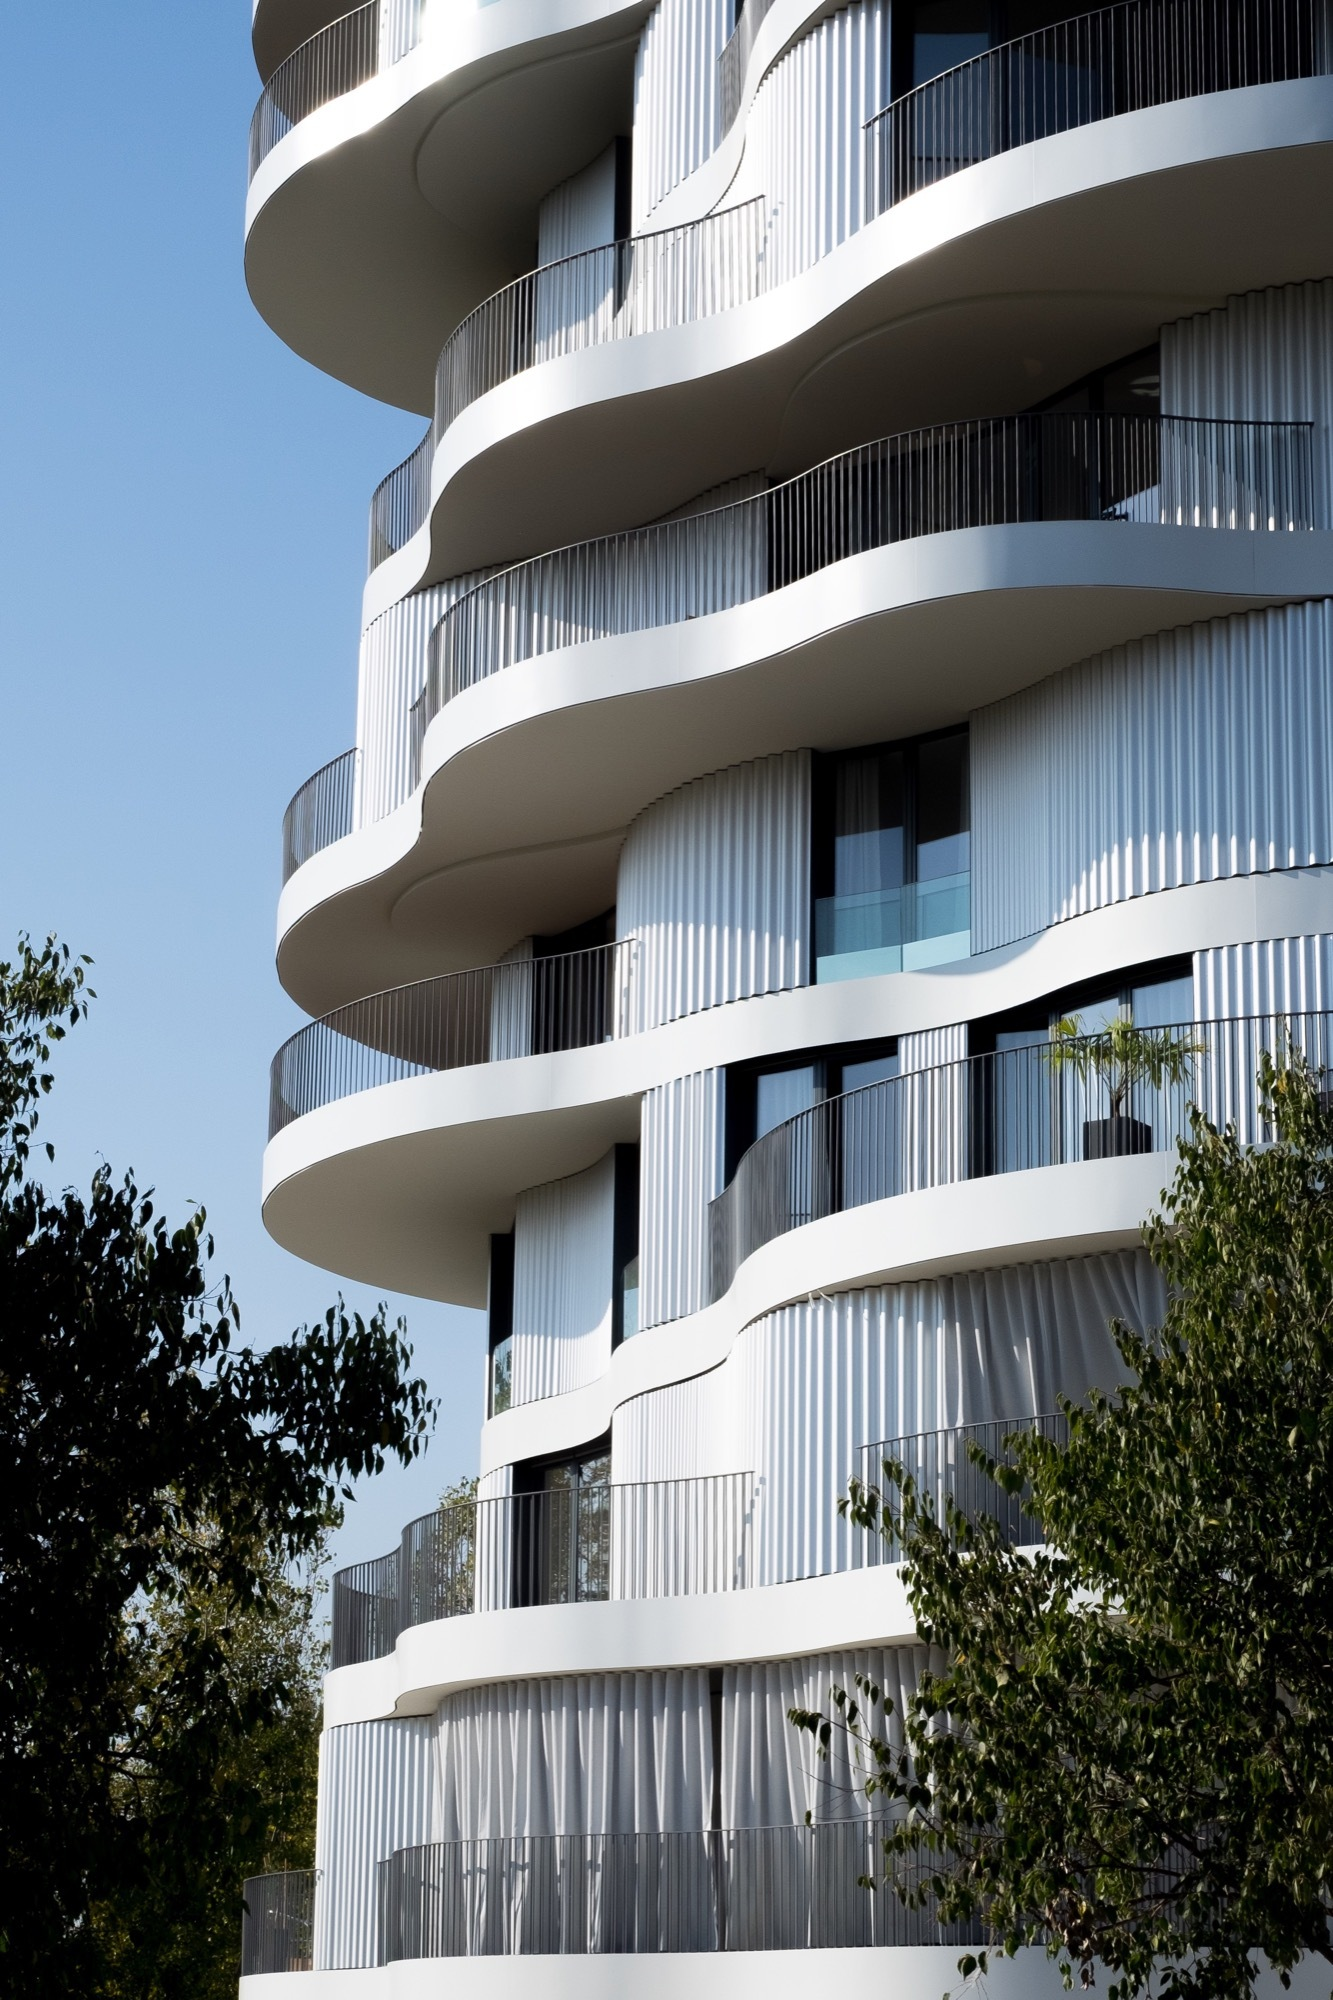 Folie Divine Farshid Moussavi Architecture Archdaily